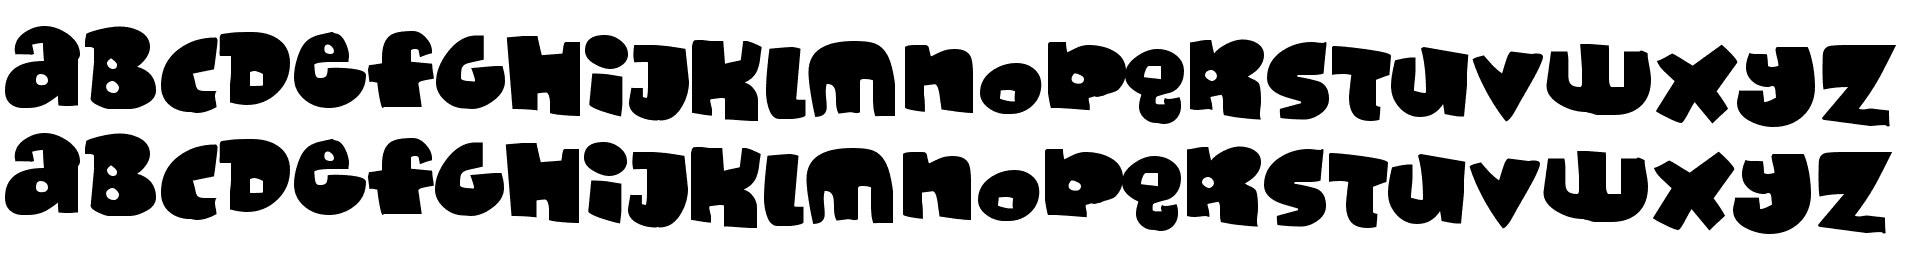 Monafont